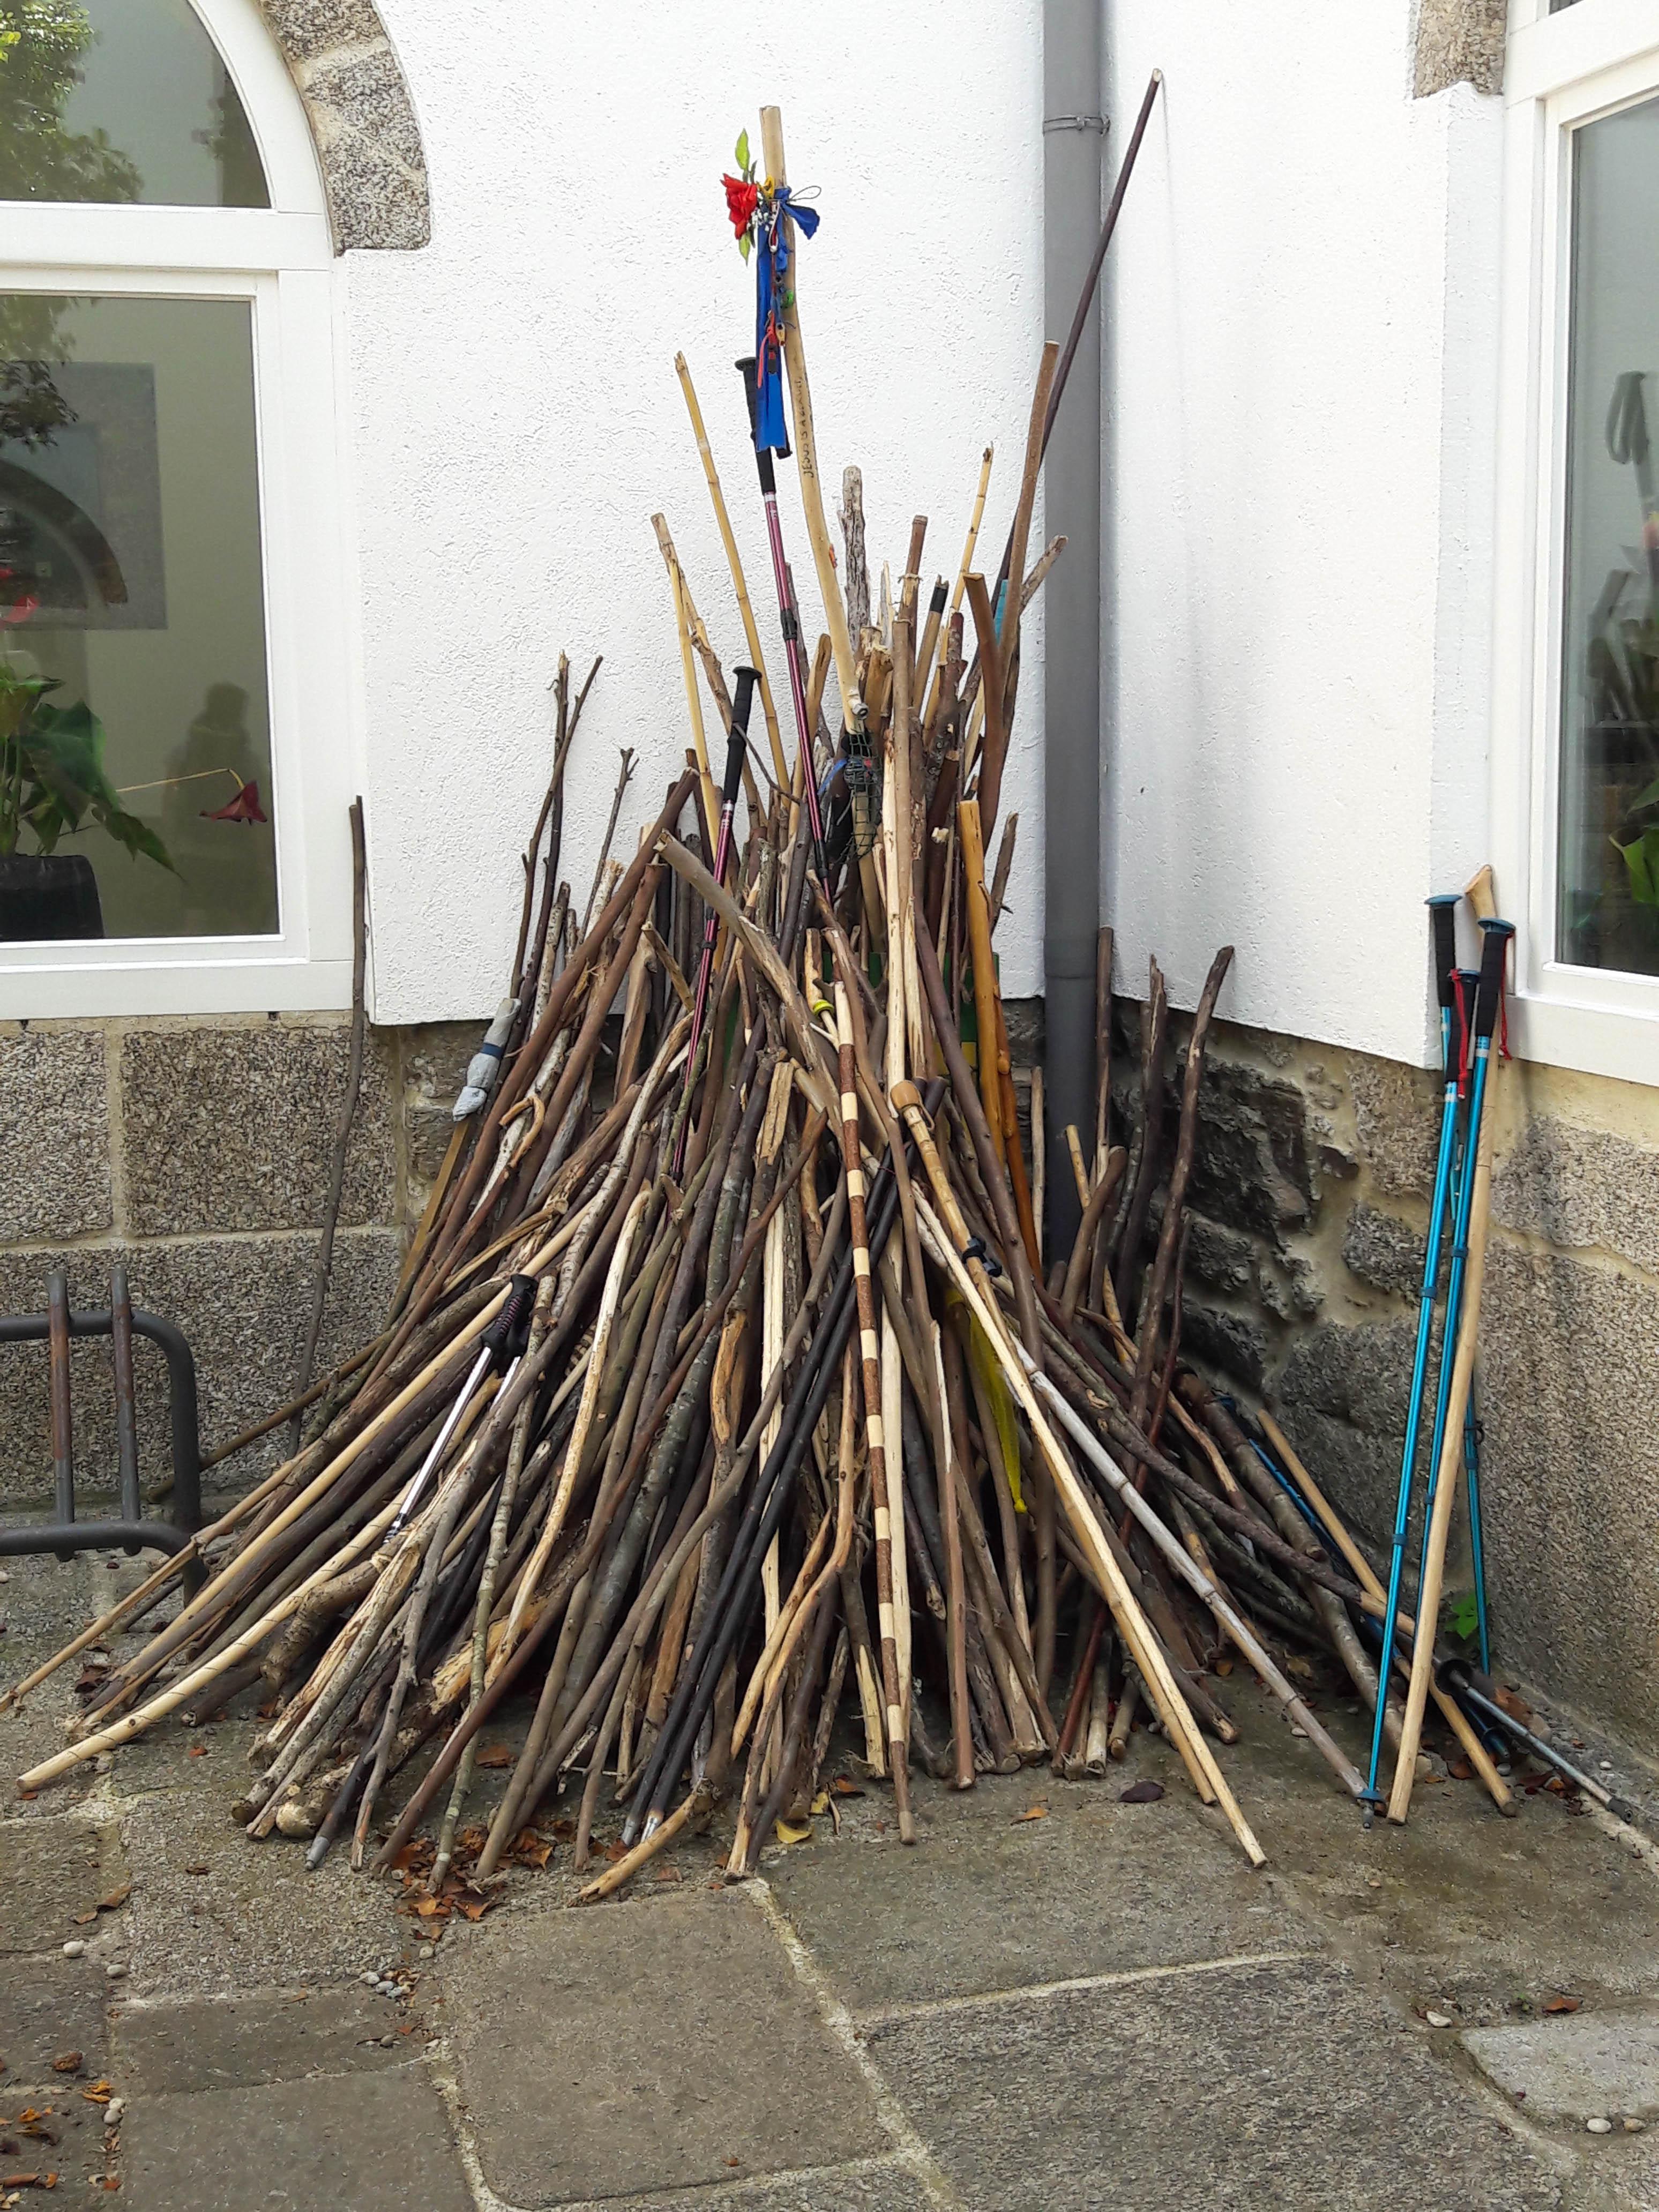 Pilgrims' discarded walking poles